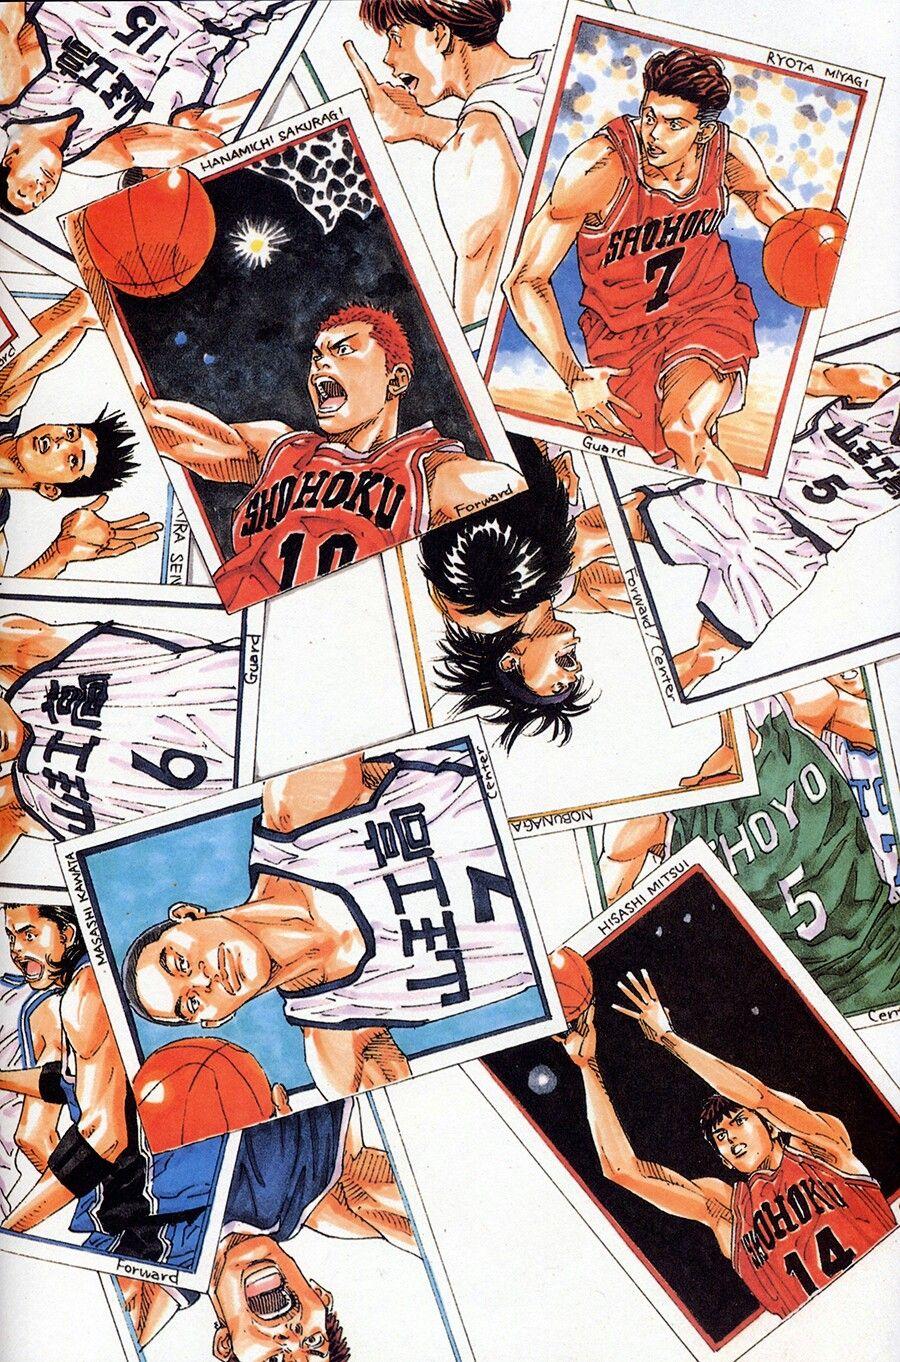 Slam dunk スラムダンク, スマホケース デザイン, 漫画イラスト